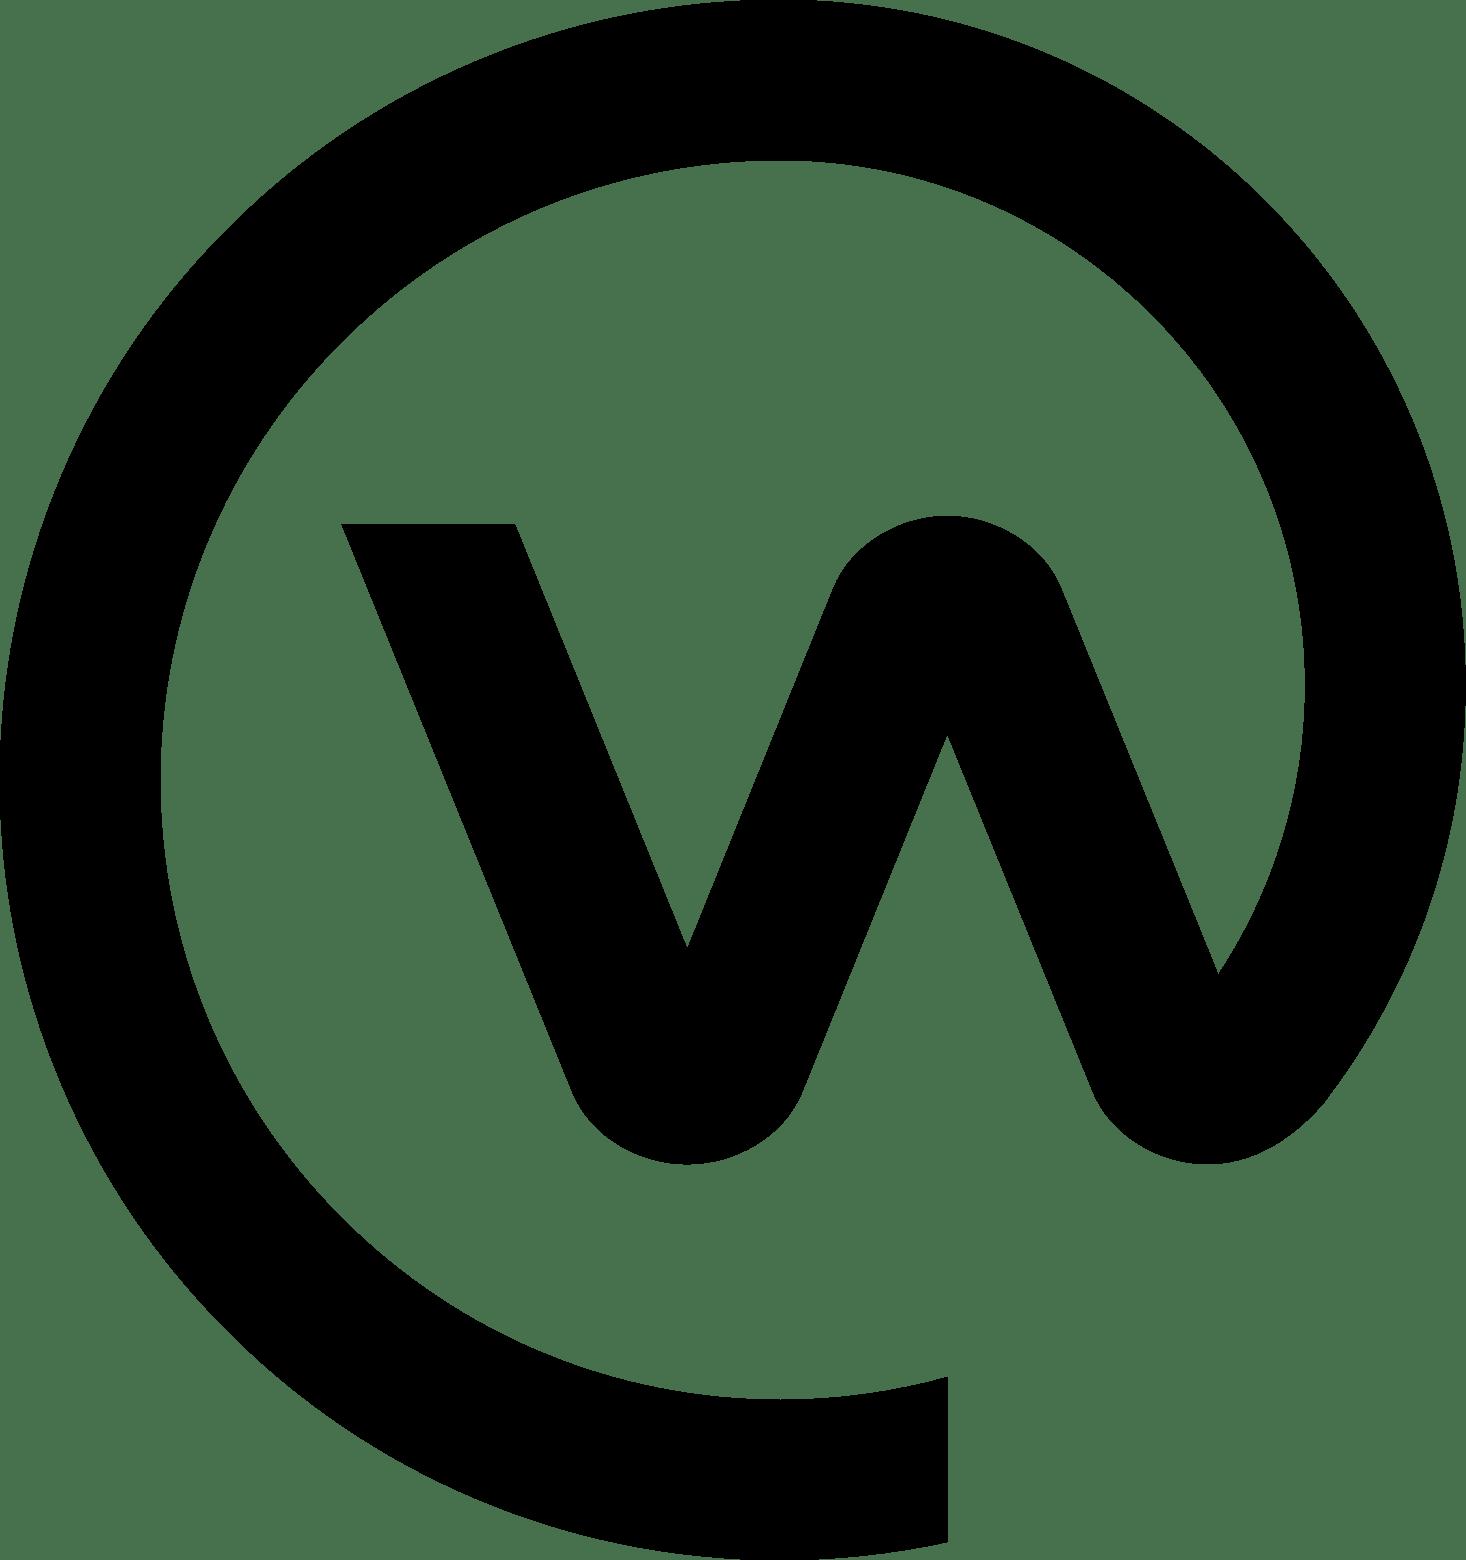 Webex Meetings Streaming to Workplace from Facebook (meetings)